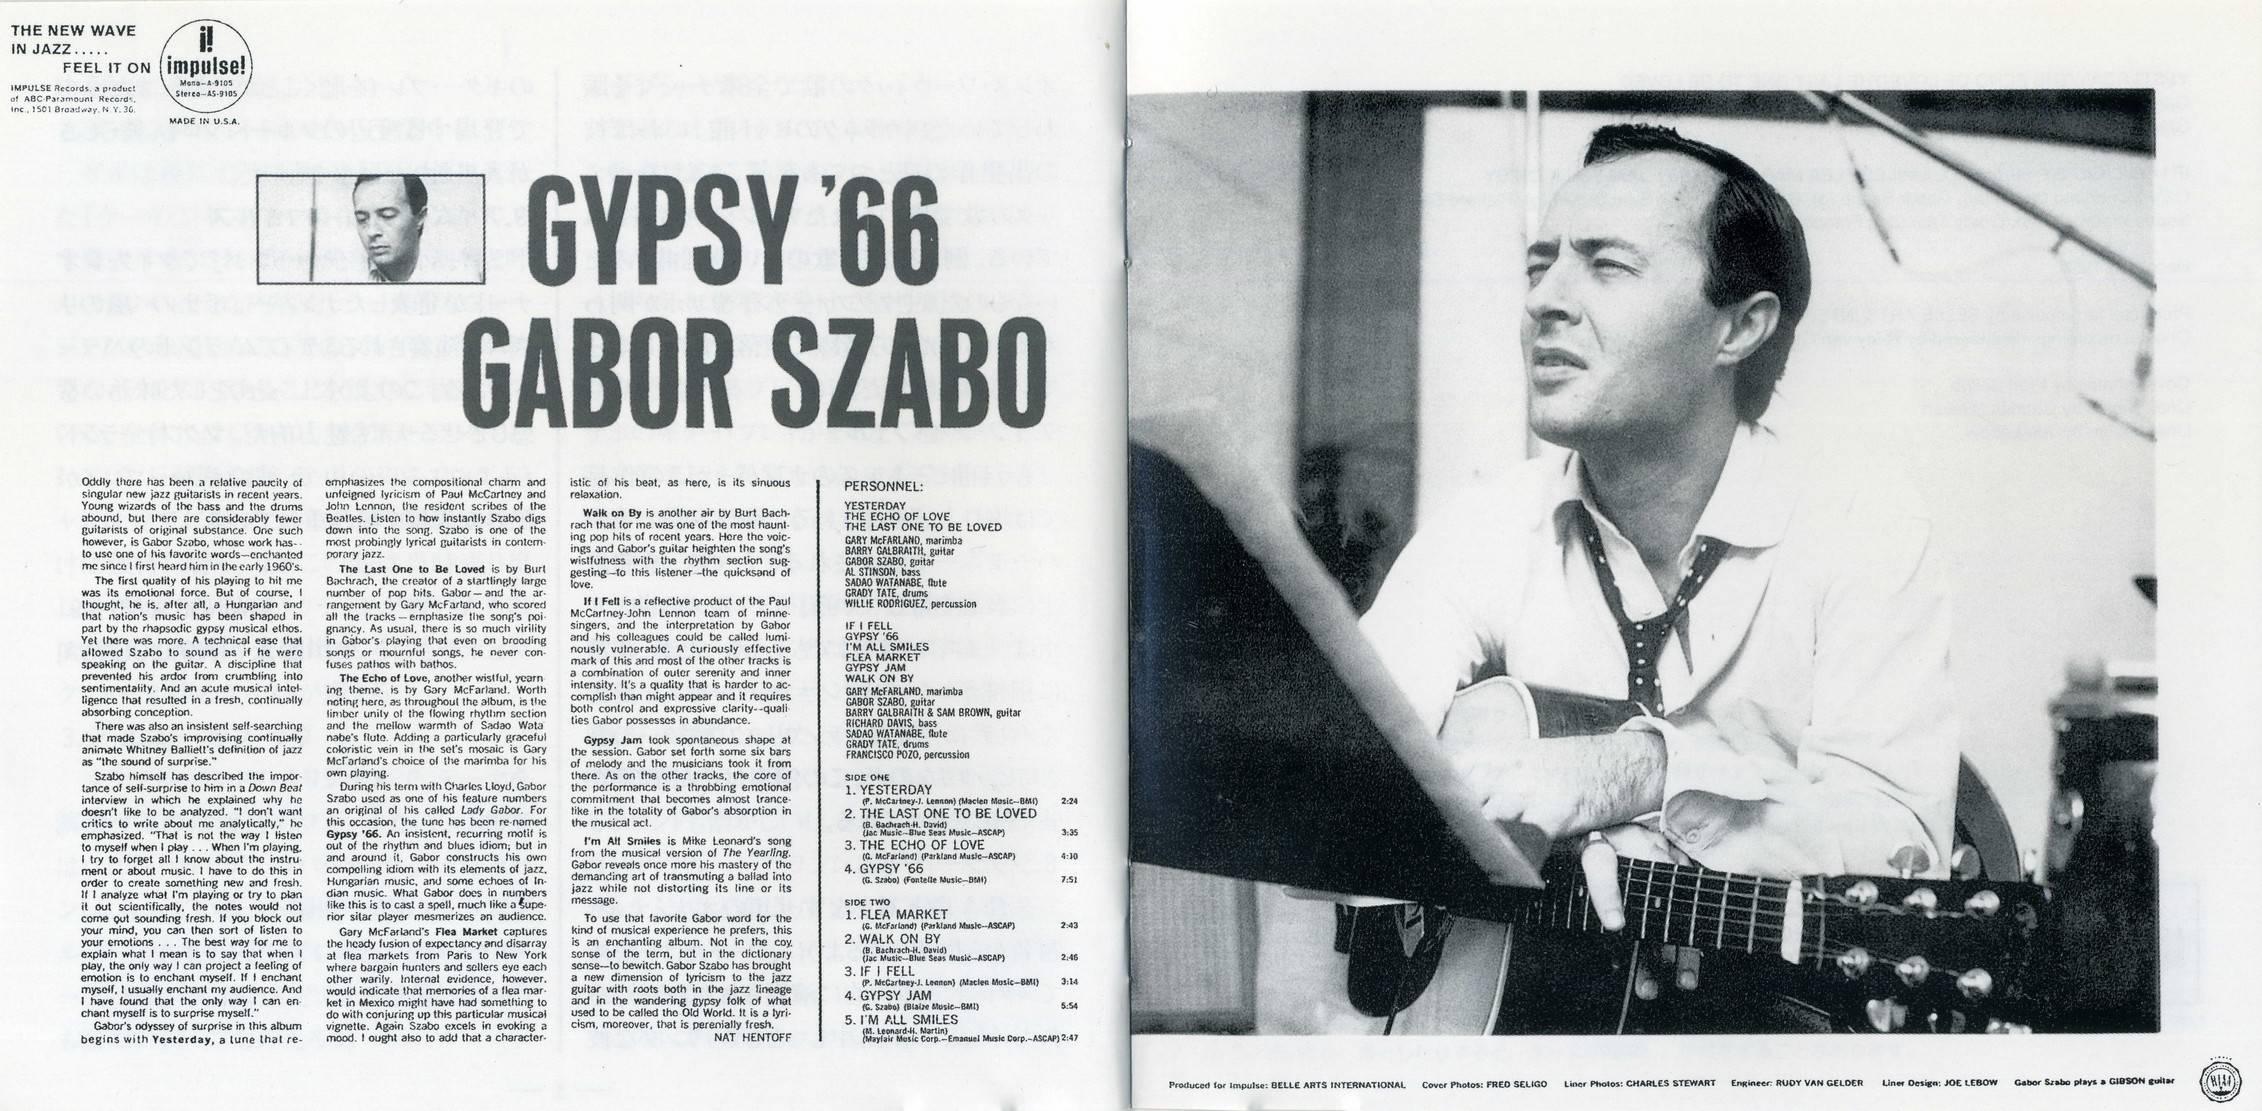 Gabor Szabo - Gypsy '66 (1965) {2005 Impulse! Japan Jazz The Best Series 24bit Remaster UCCU-5271}